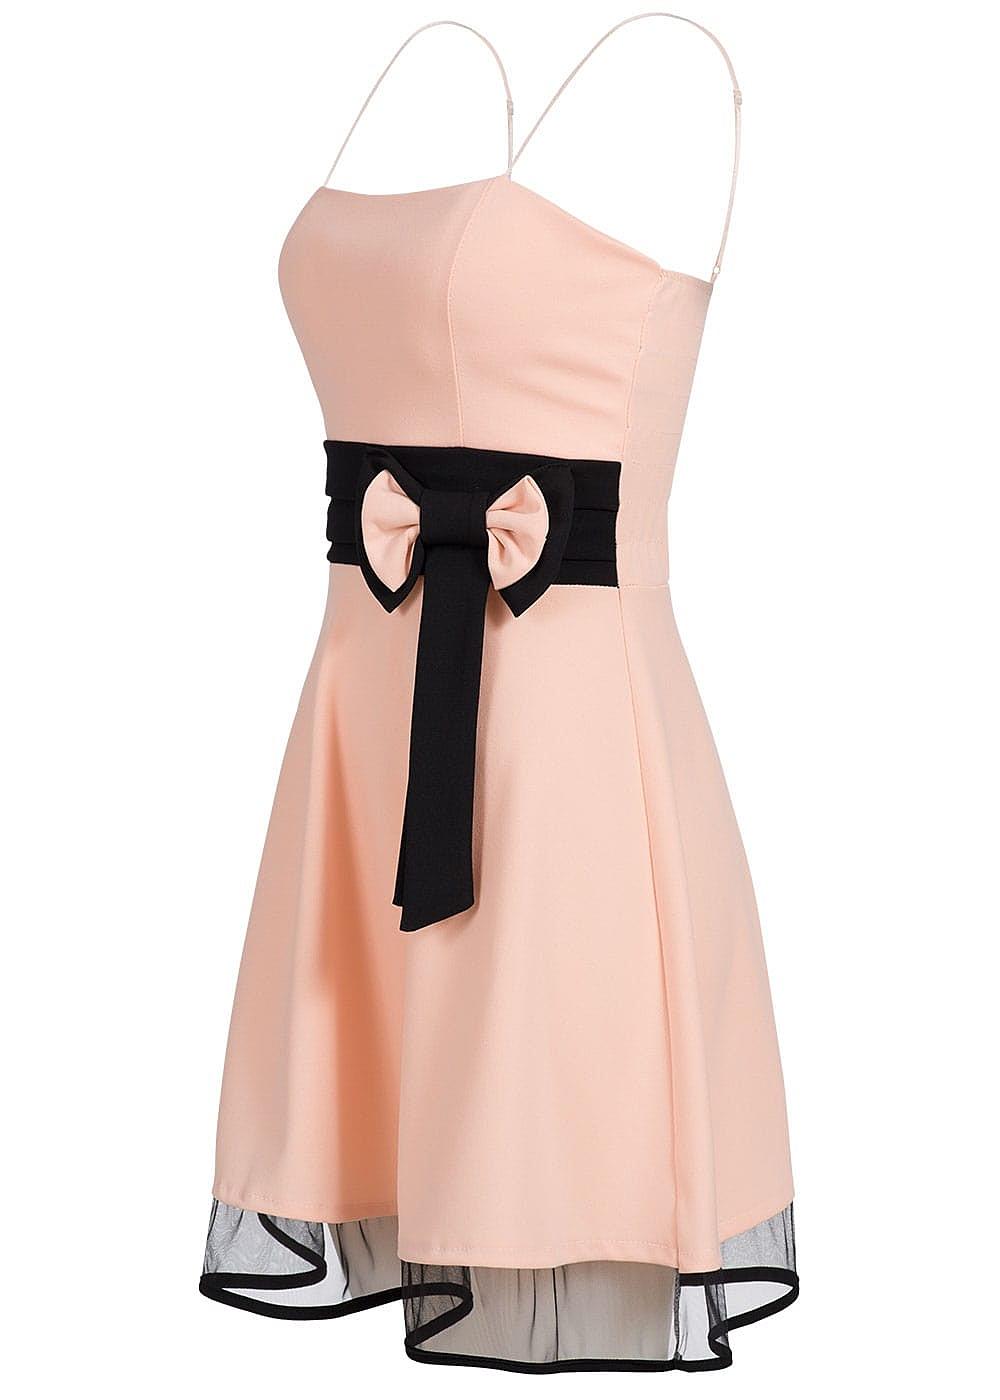 styleboom fashion damen mini spaghettitr ger kleid schleife brustpads rosa schwarz 77onlineshop. Black Bedroom Furniture Sets. Home Design Ideas